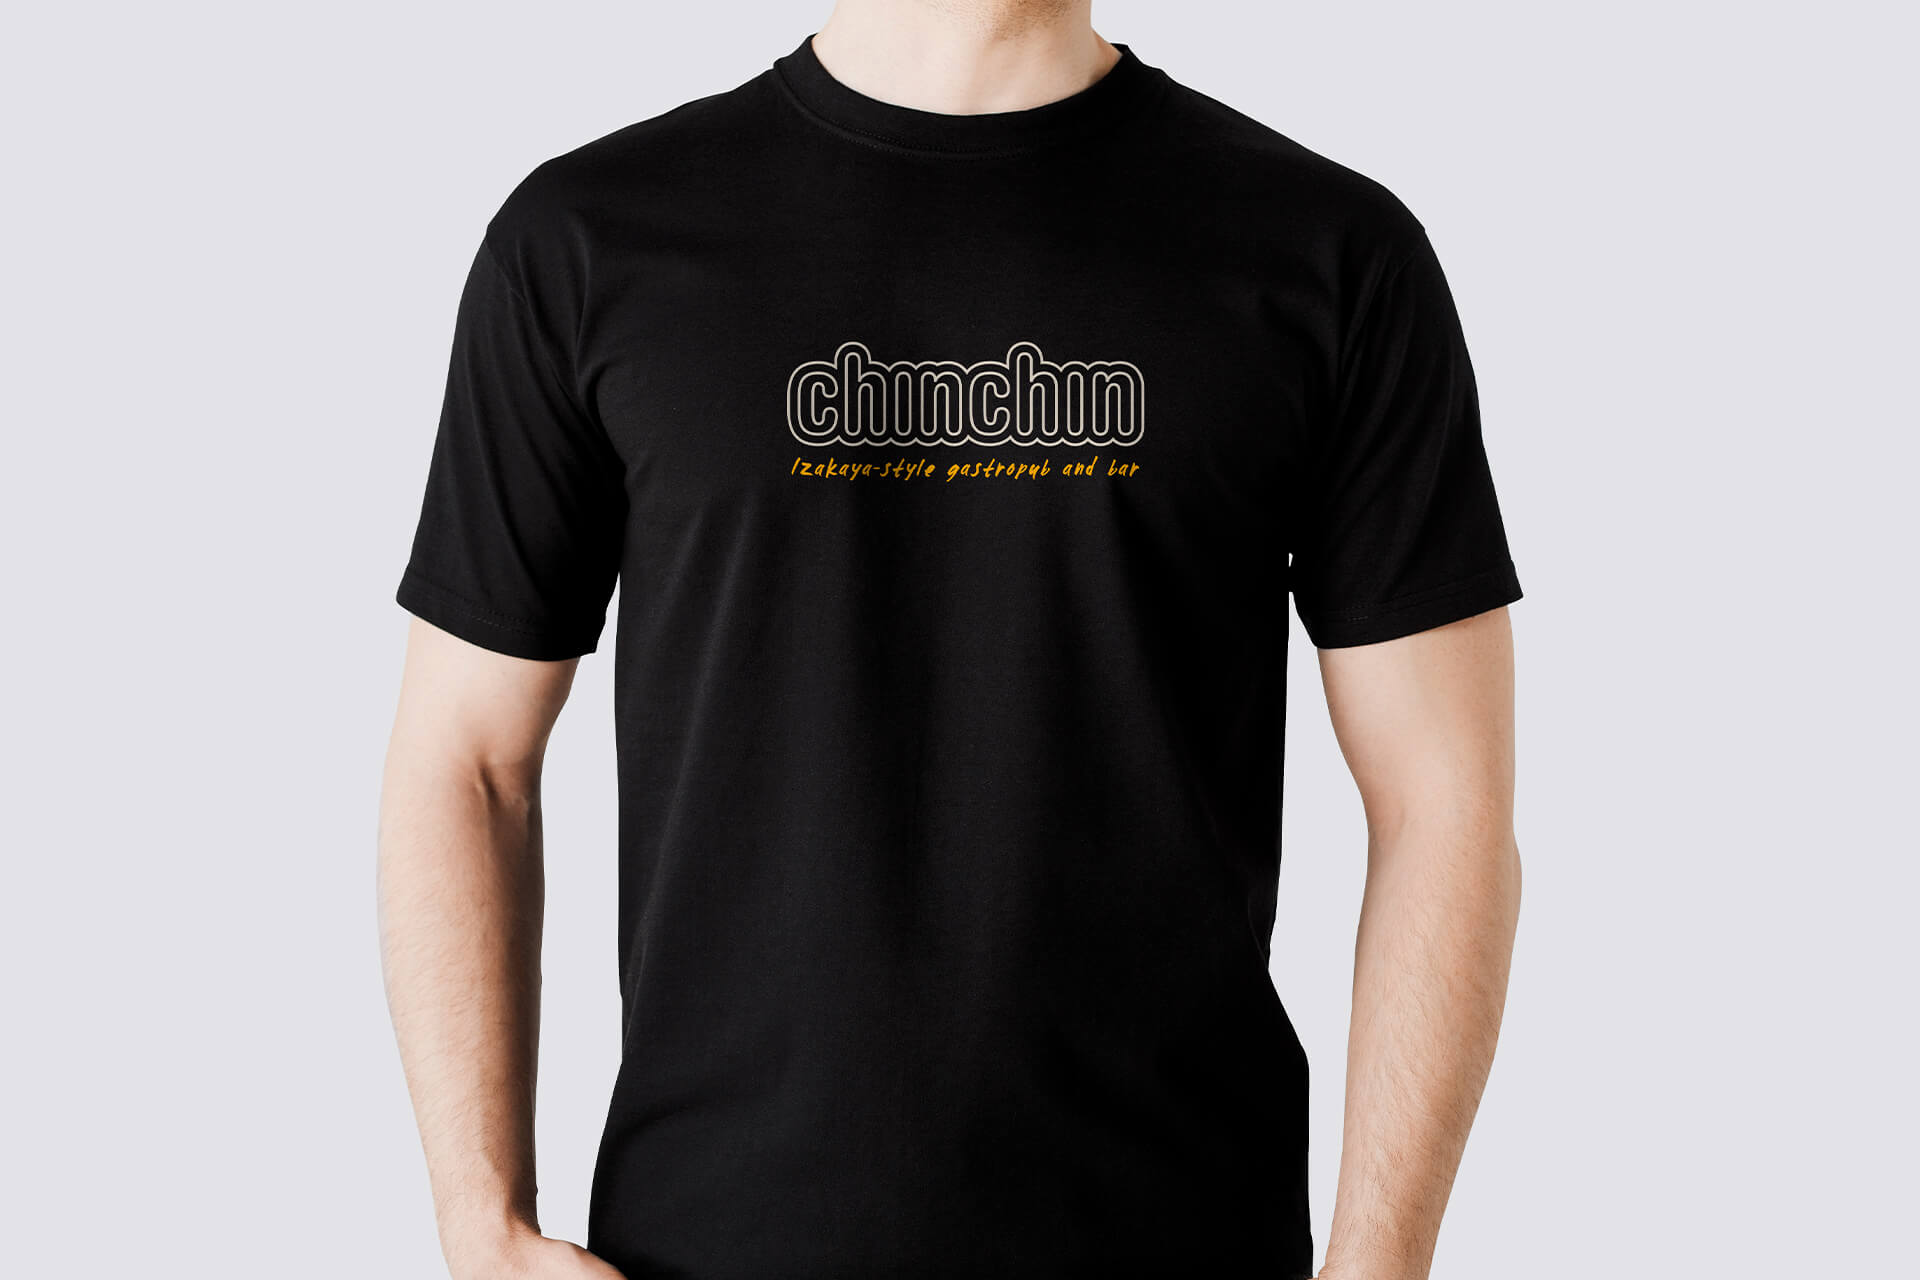 Chin Chin T-shirt Design